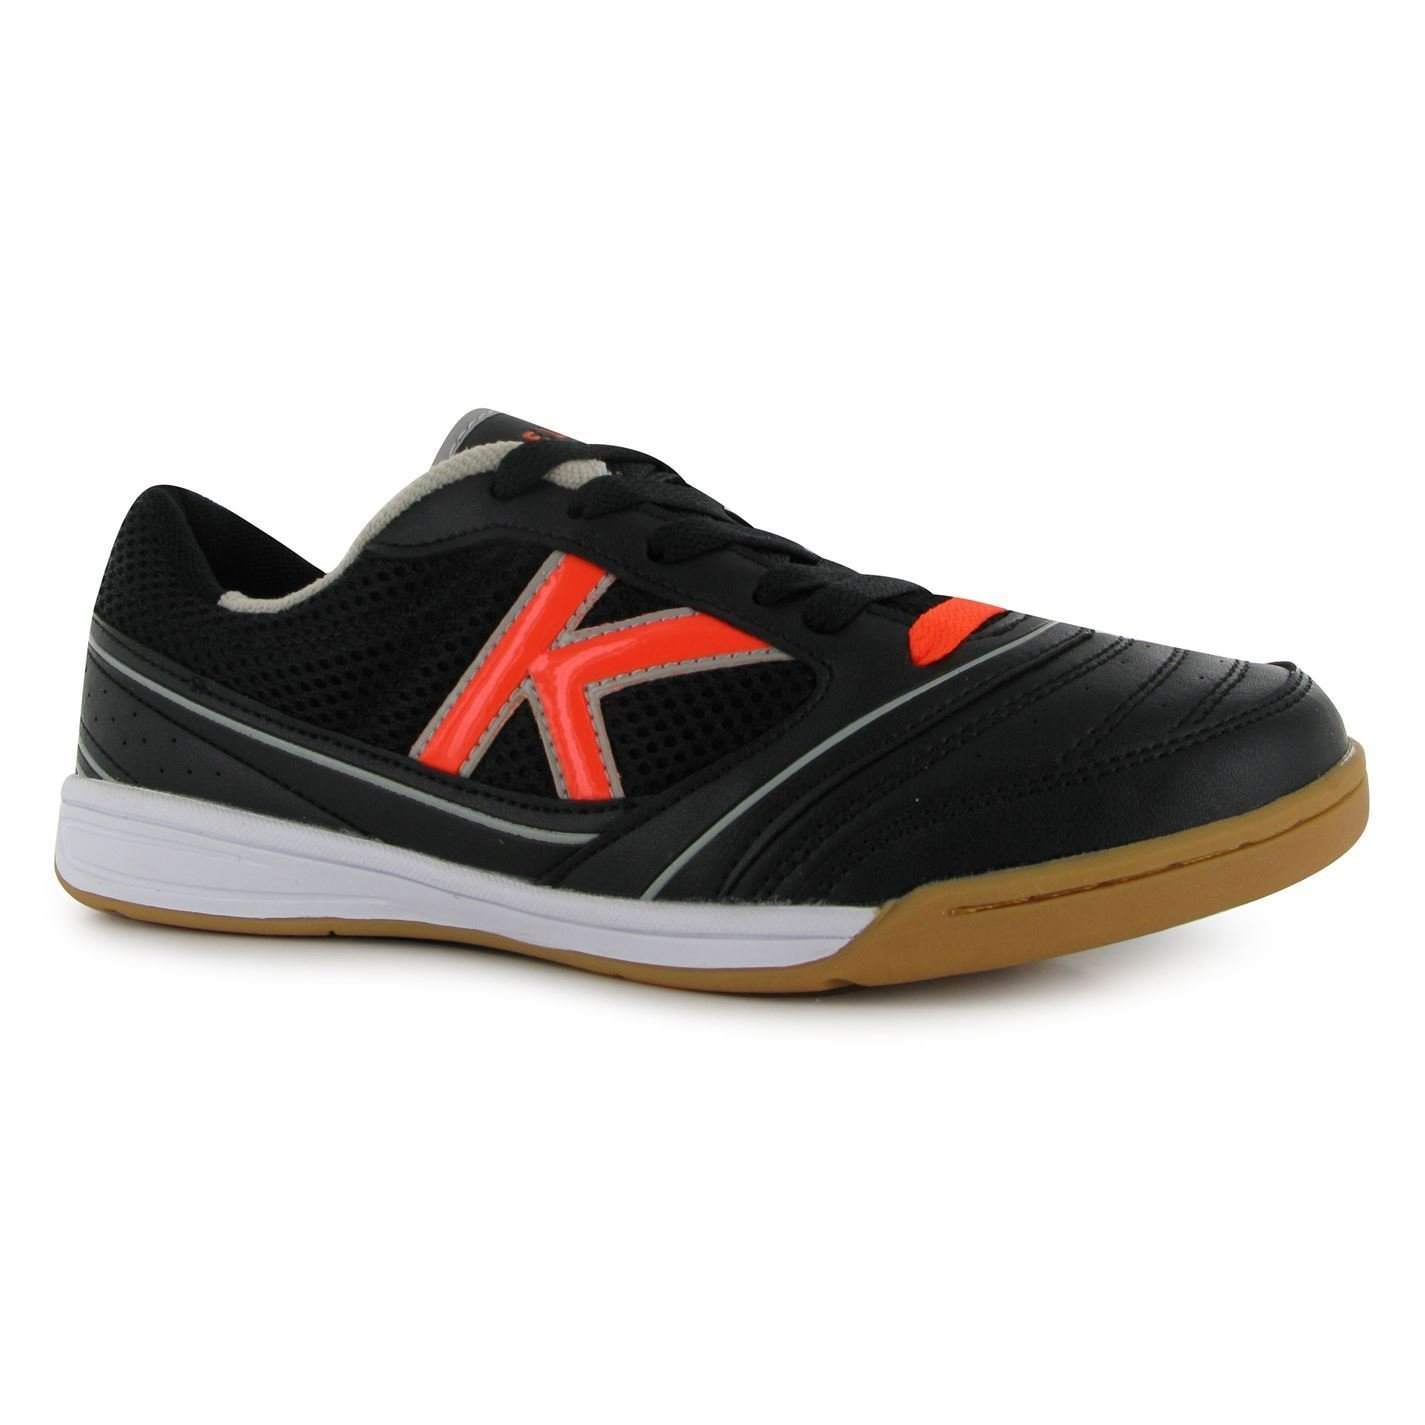 Kelme America Hallenfußball Futsal Trainer Herren Schwarz Orange Fußball Sneakers